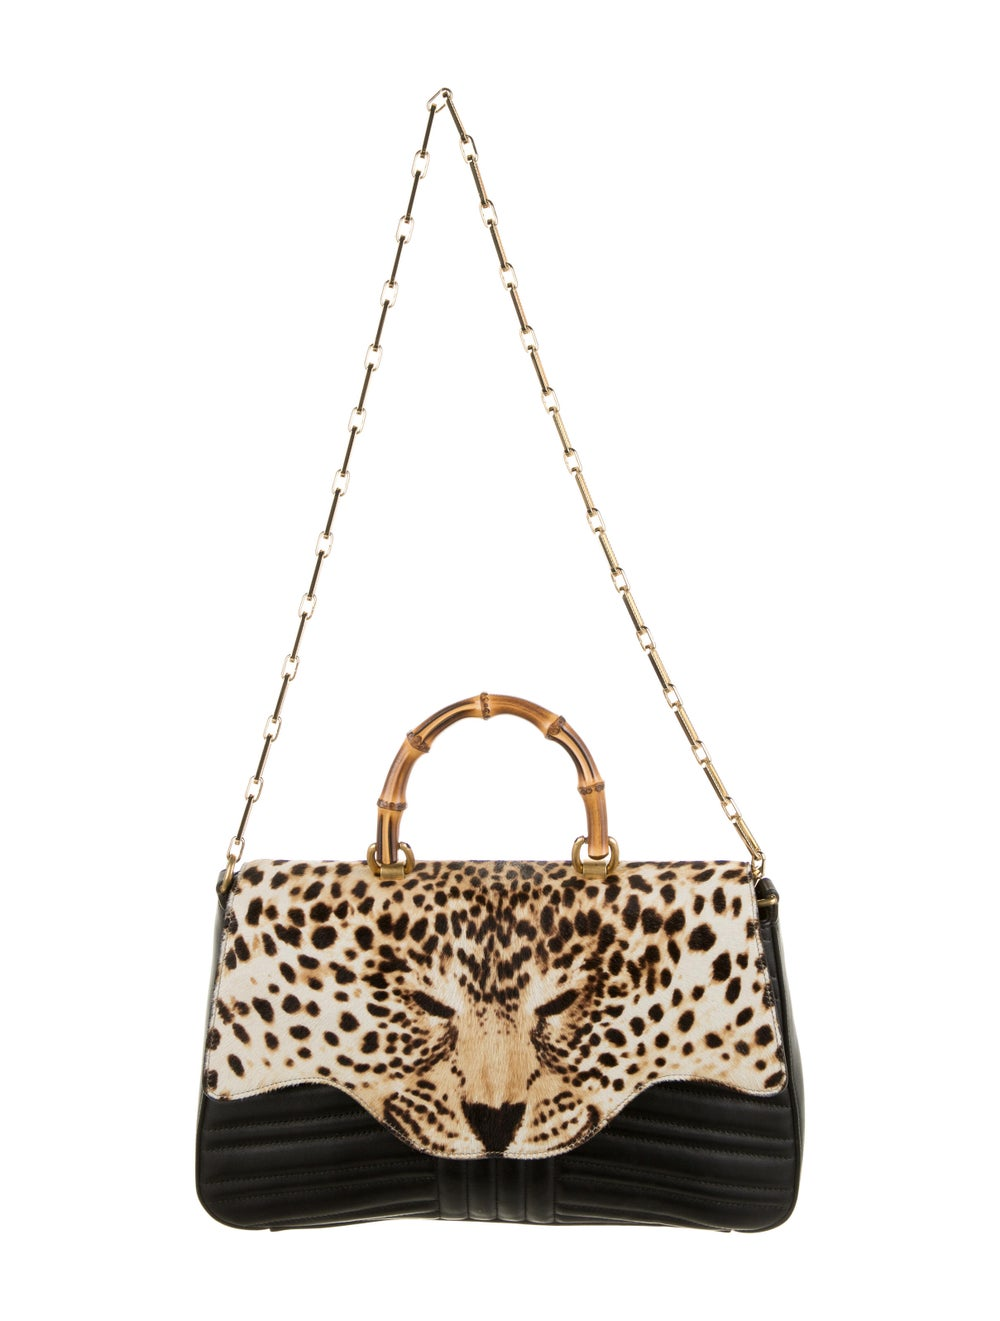 Gucci Bamboo Leopard Top Handle Bag Black - image 5